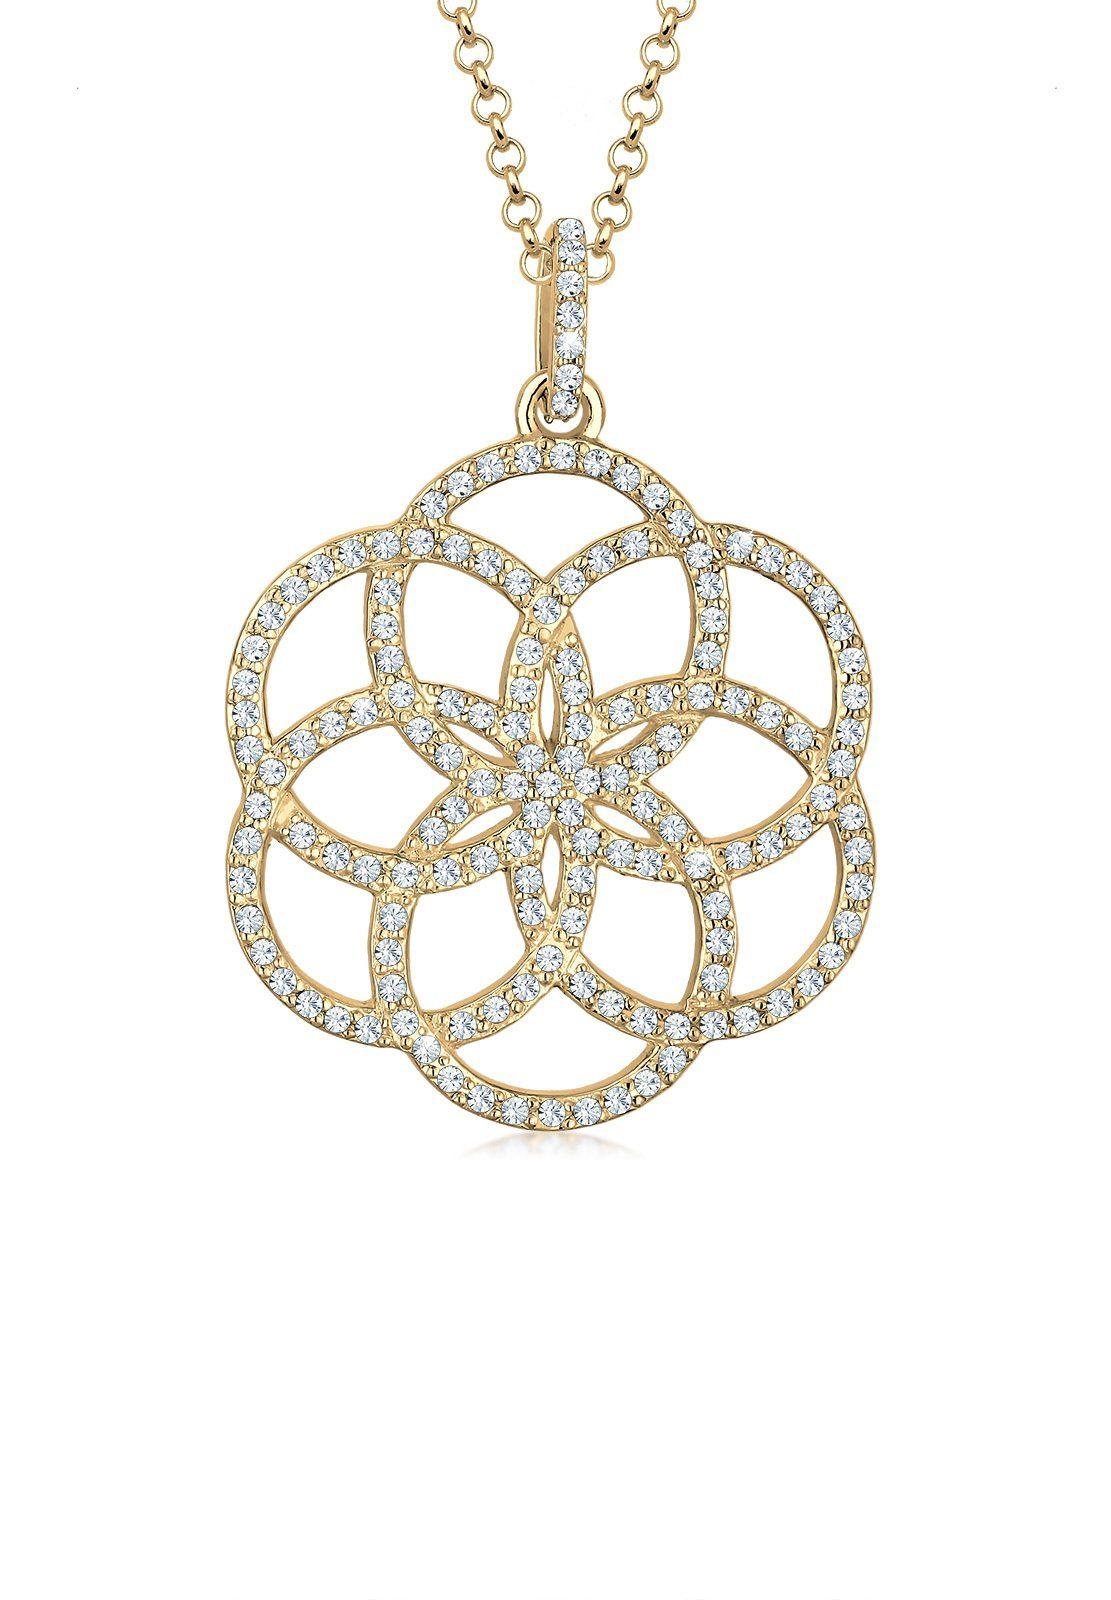 925 SILBER Collier Kette Medaillon Halsketten mit Damen Anhänger 3D Silberblüte